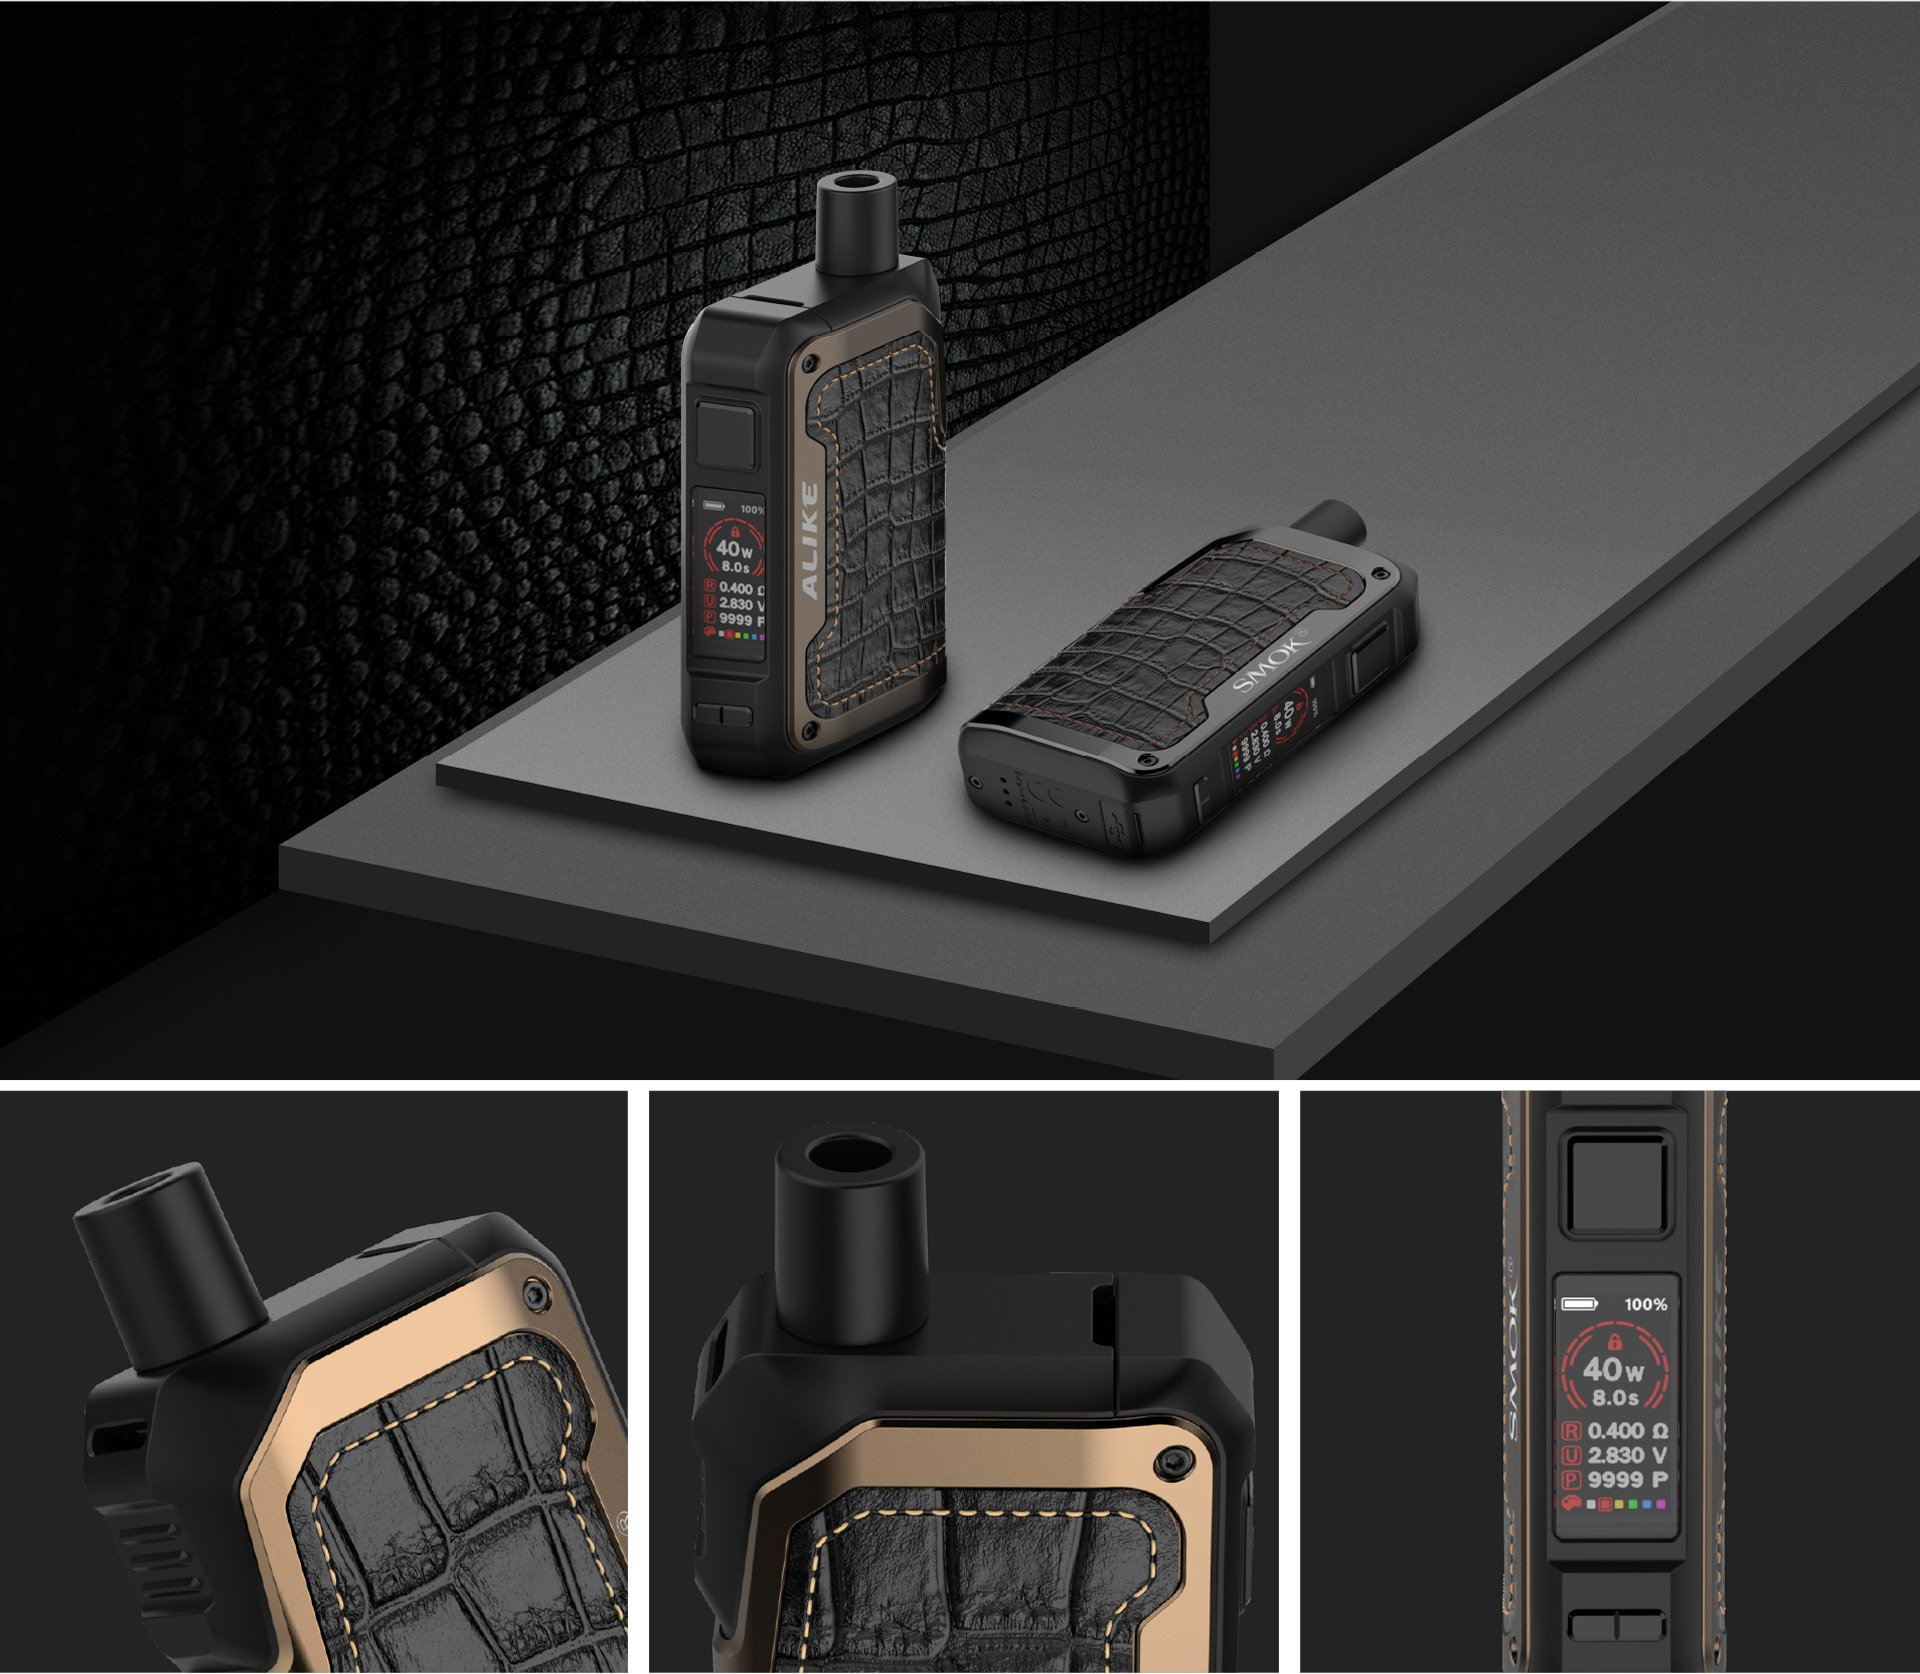 Smok Alike Kit UK Innovation